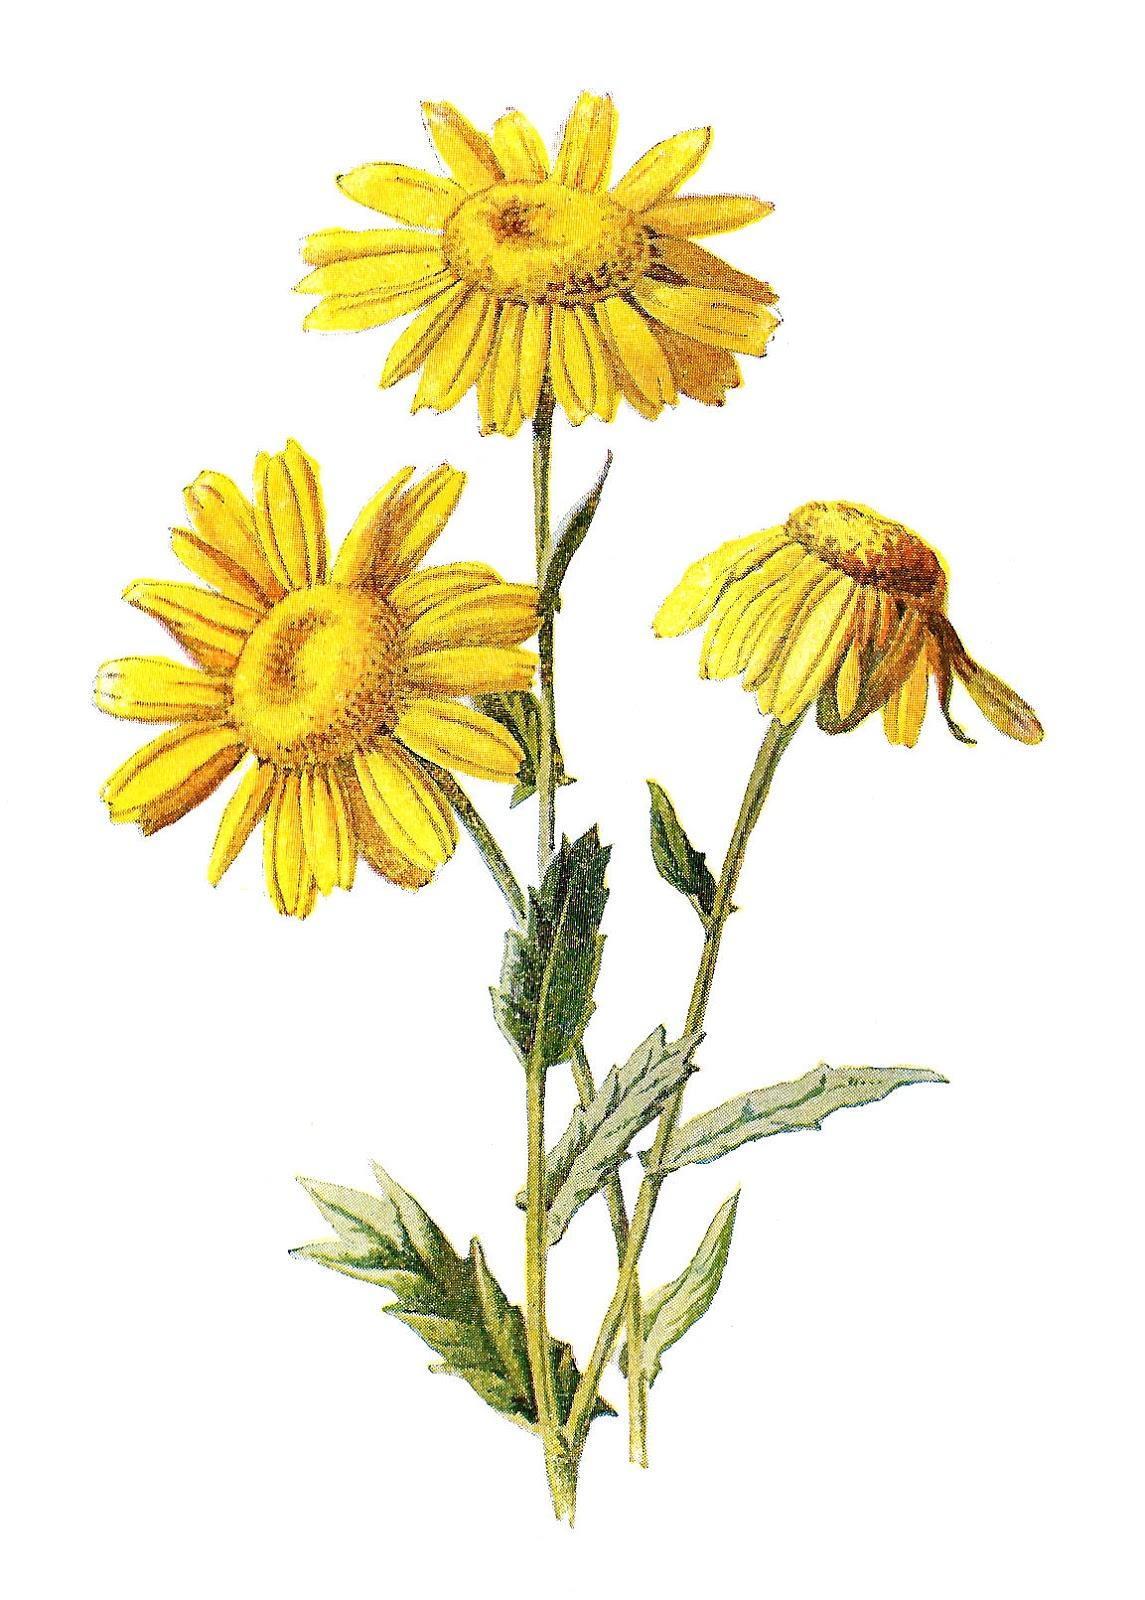 Wildflower clipart yellow flower Wildflower clipart Wildflower drawings Download